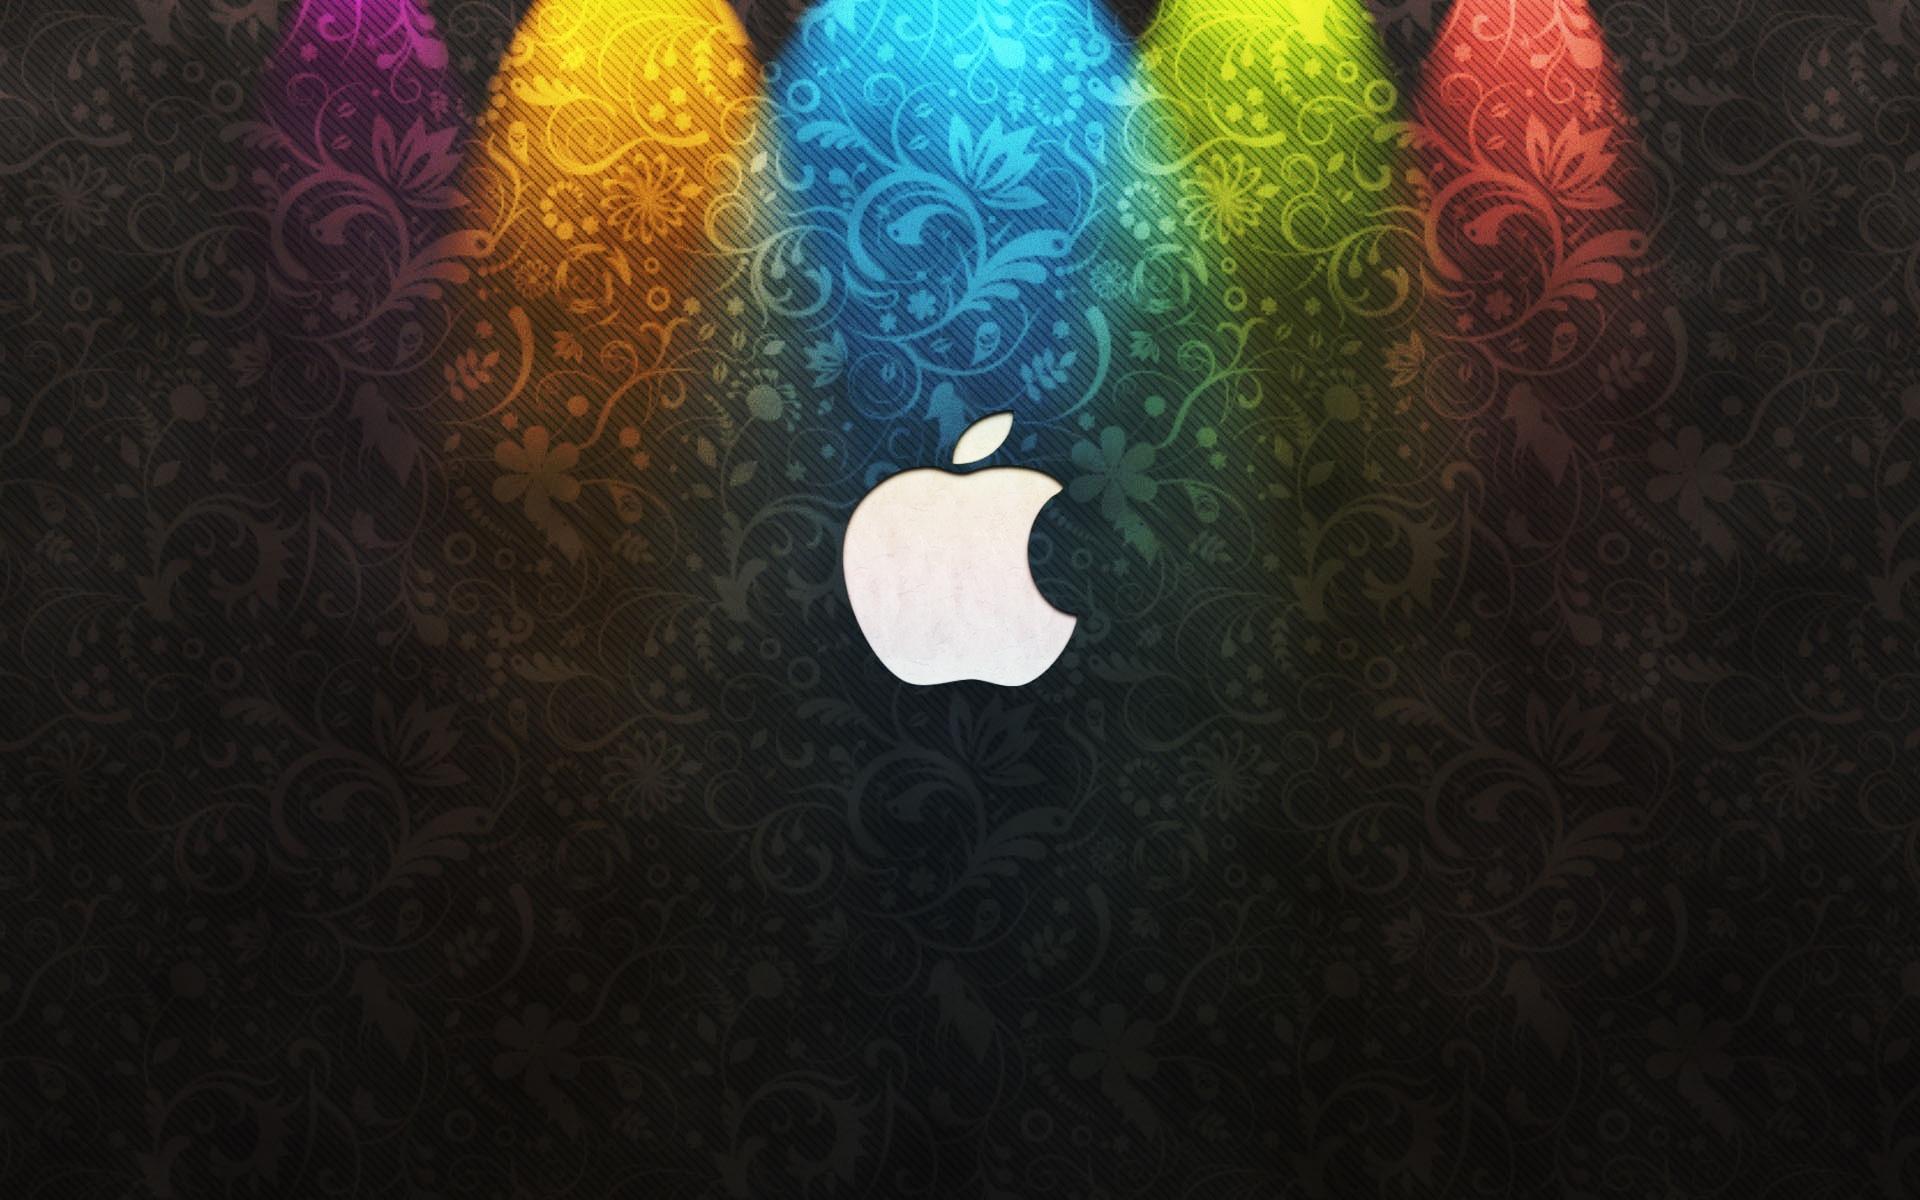 Wallpaper 4k Beautiful Apple Logo Design Apple, Beautiful, Design, Fedora,  Logo